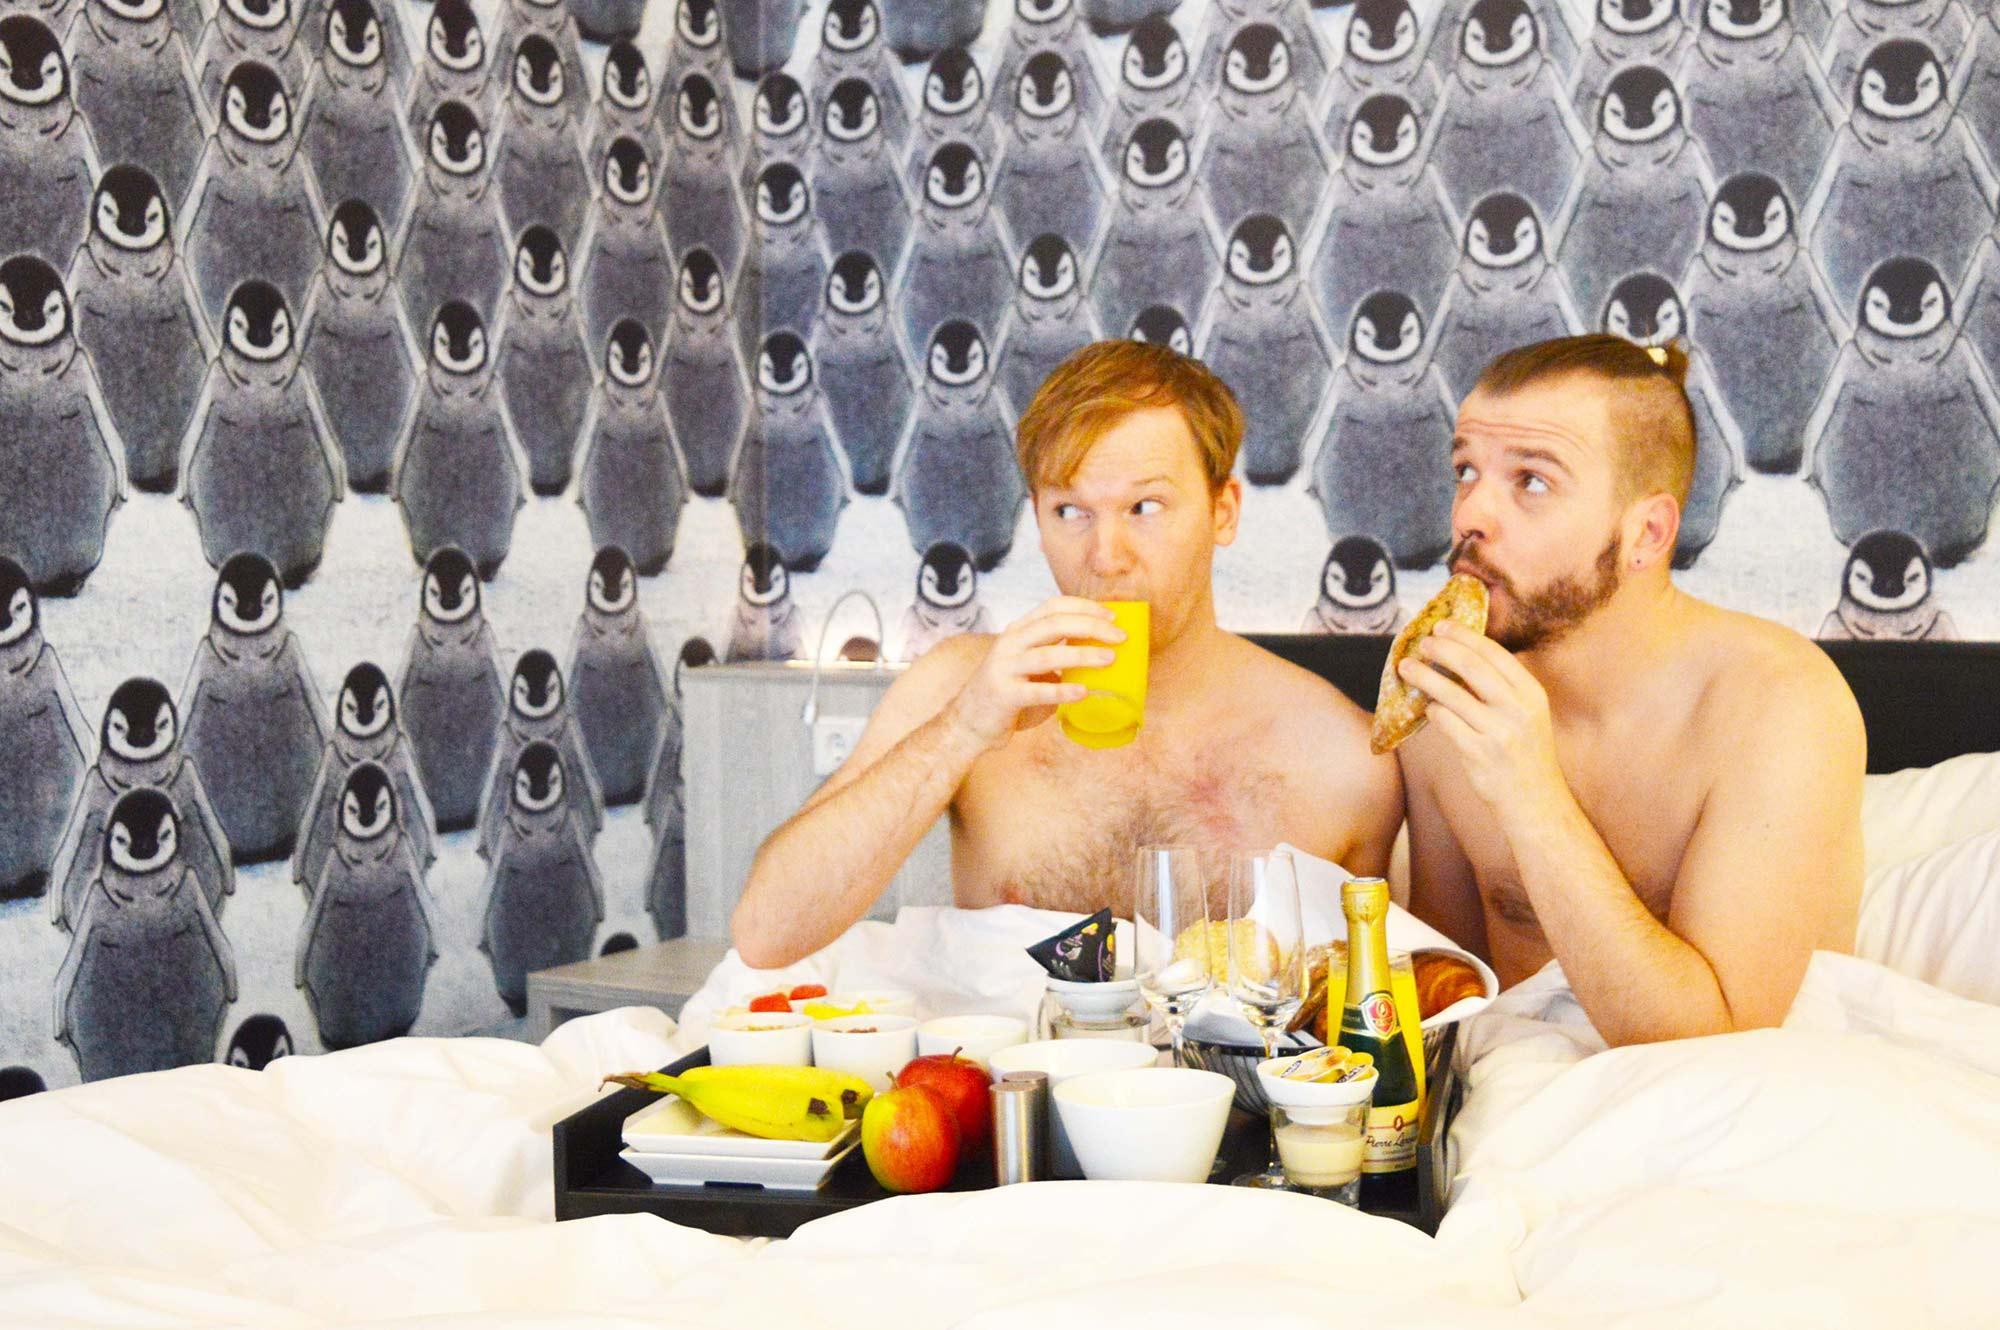 Breakfast in Bed | Mainport Hotel Rotterdam Gay-Friendly © CoupleofMen.com